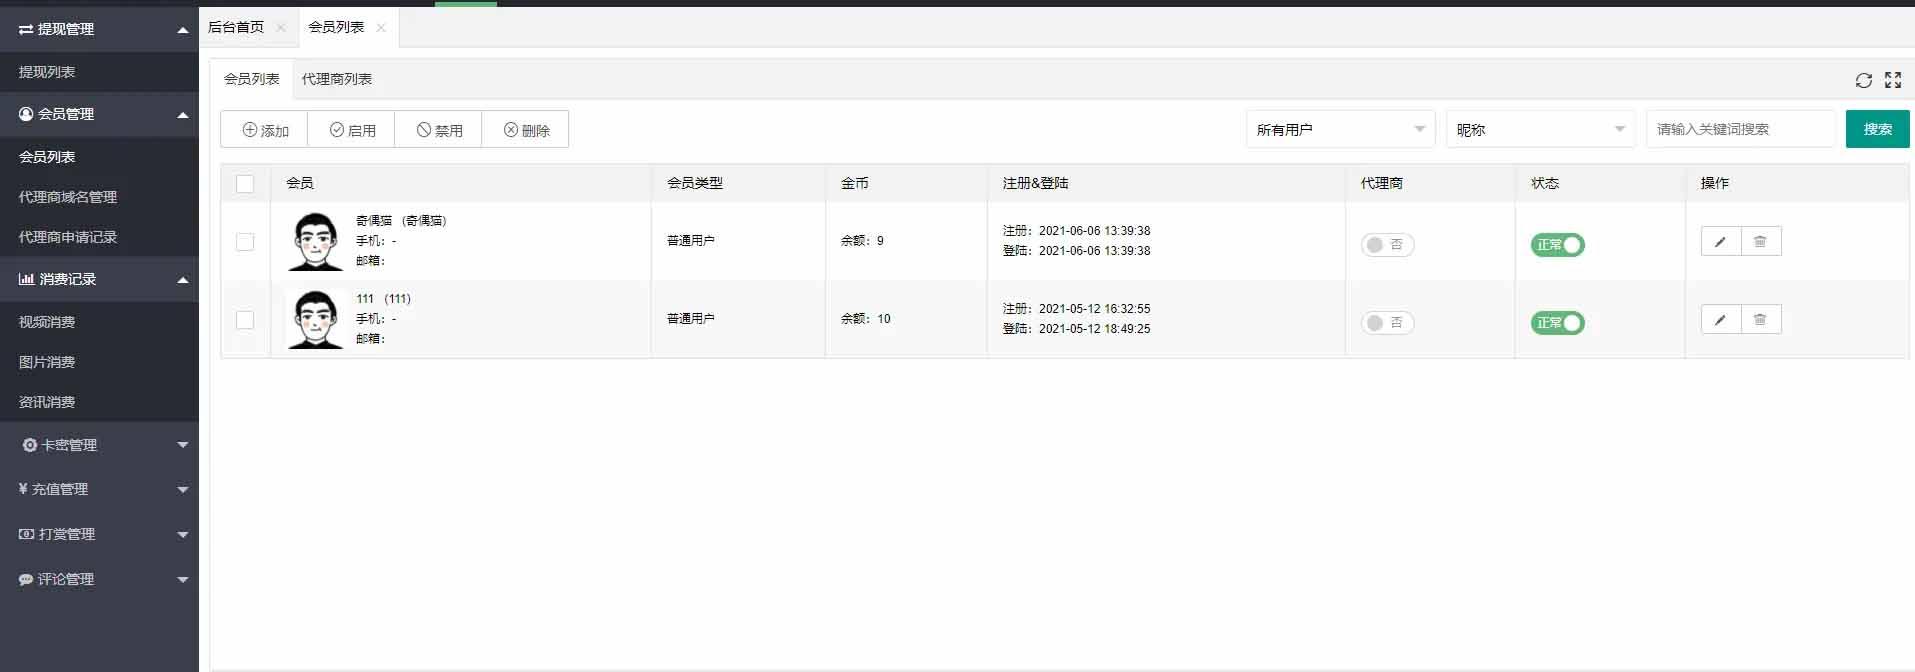 YM精品源代码 视频点播系统源代码完美版下载